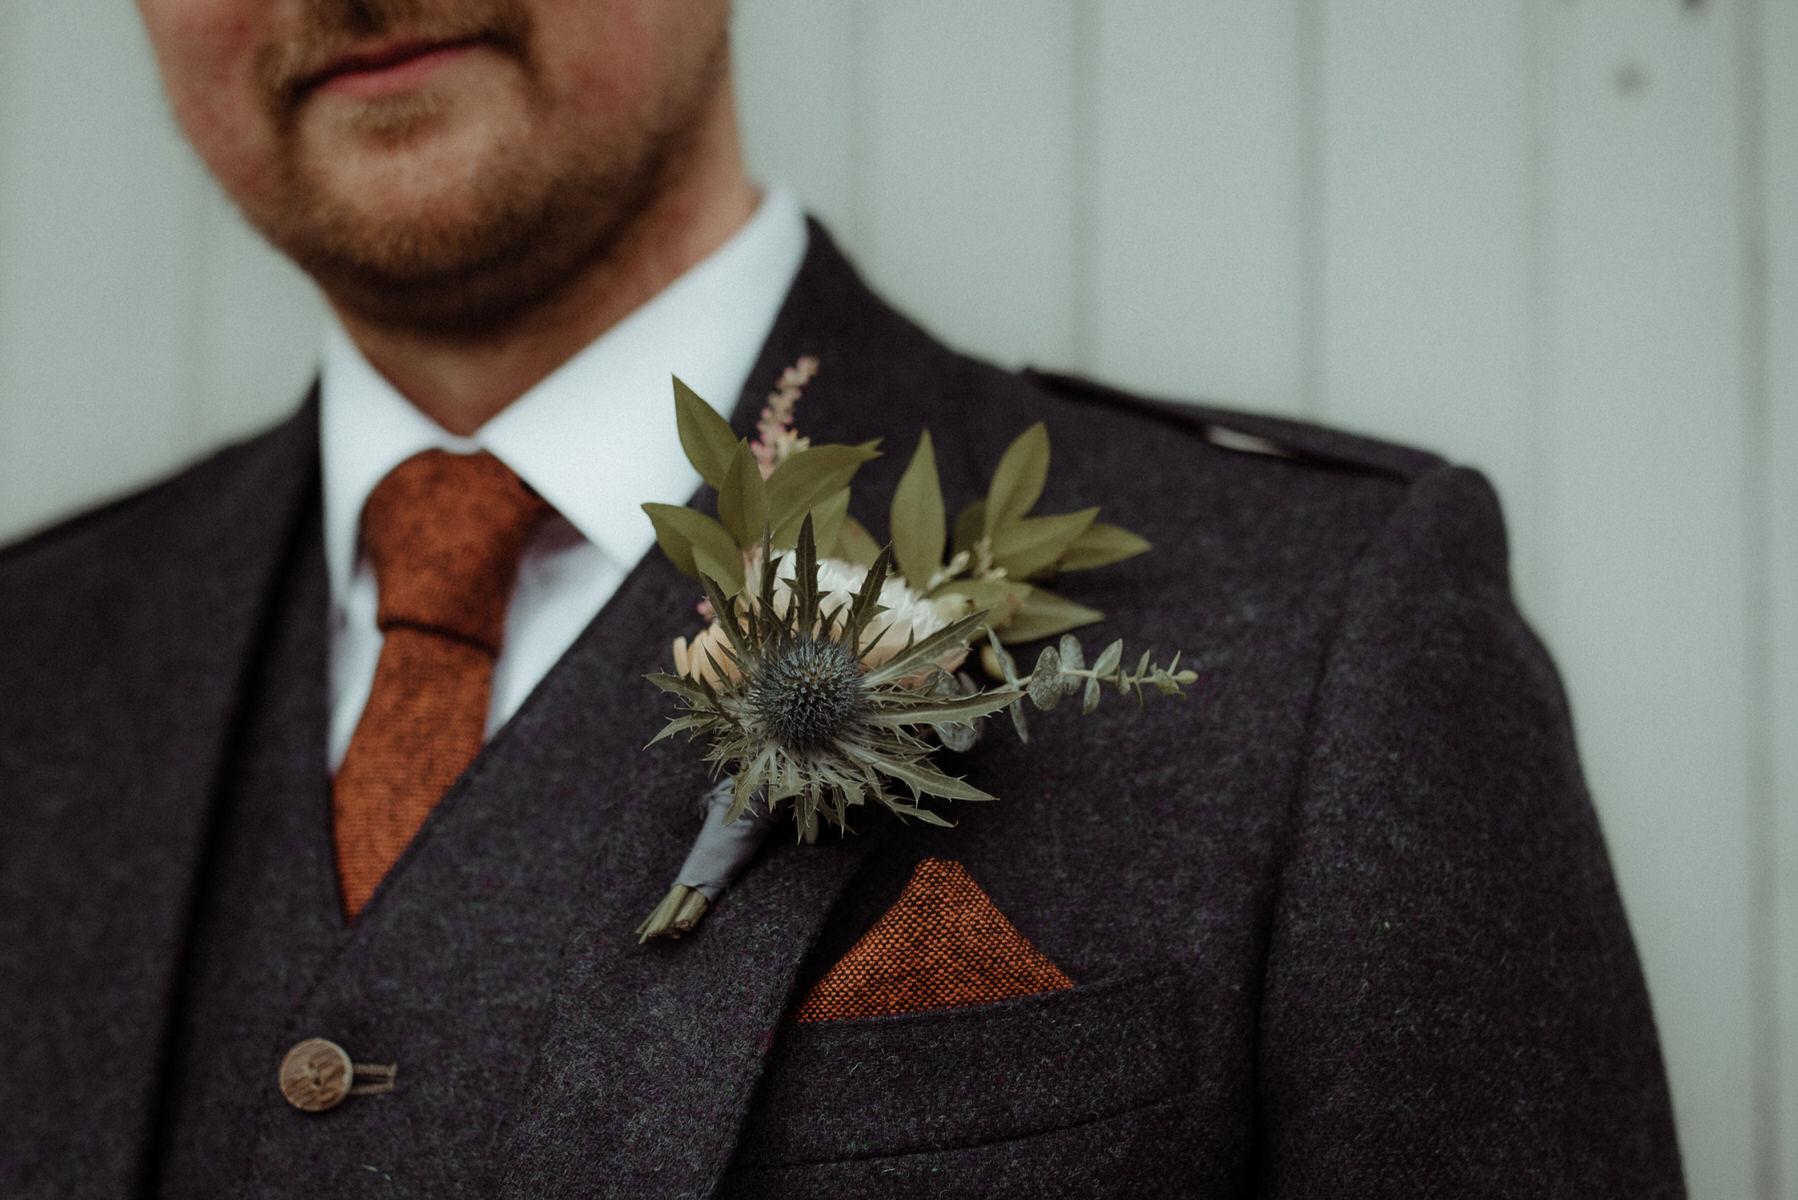 Autumnal Scottish buttonhole